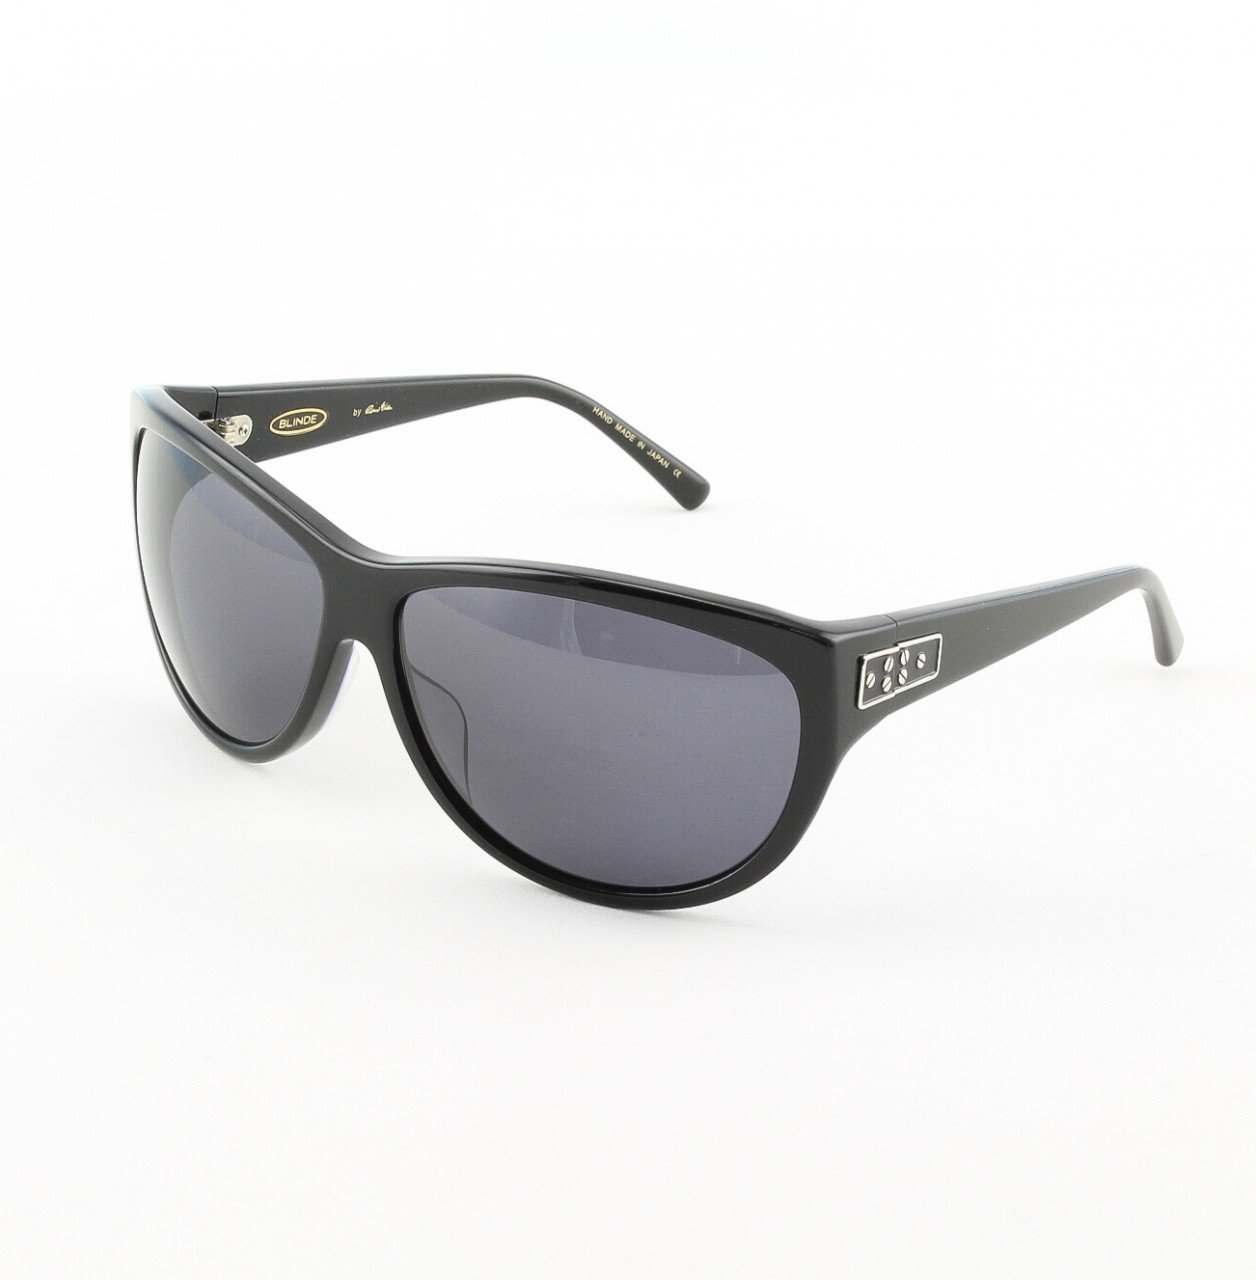 Blinde Lips Like Sugar Women's Sunglasses Col. Black with Solid Black Lenses